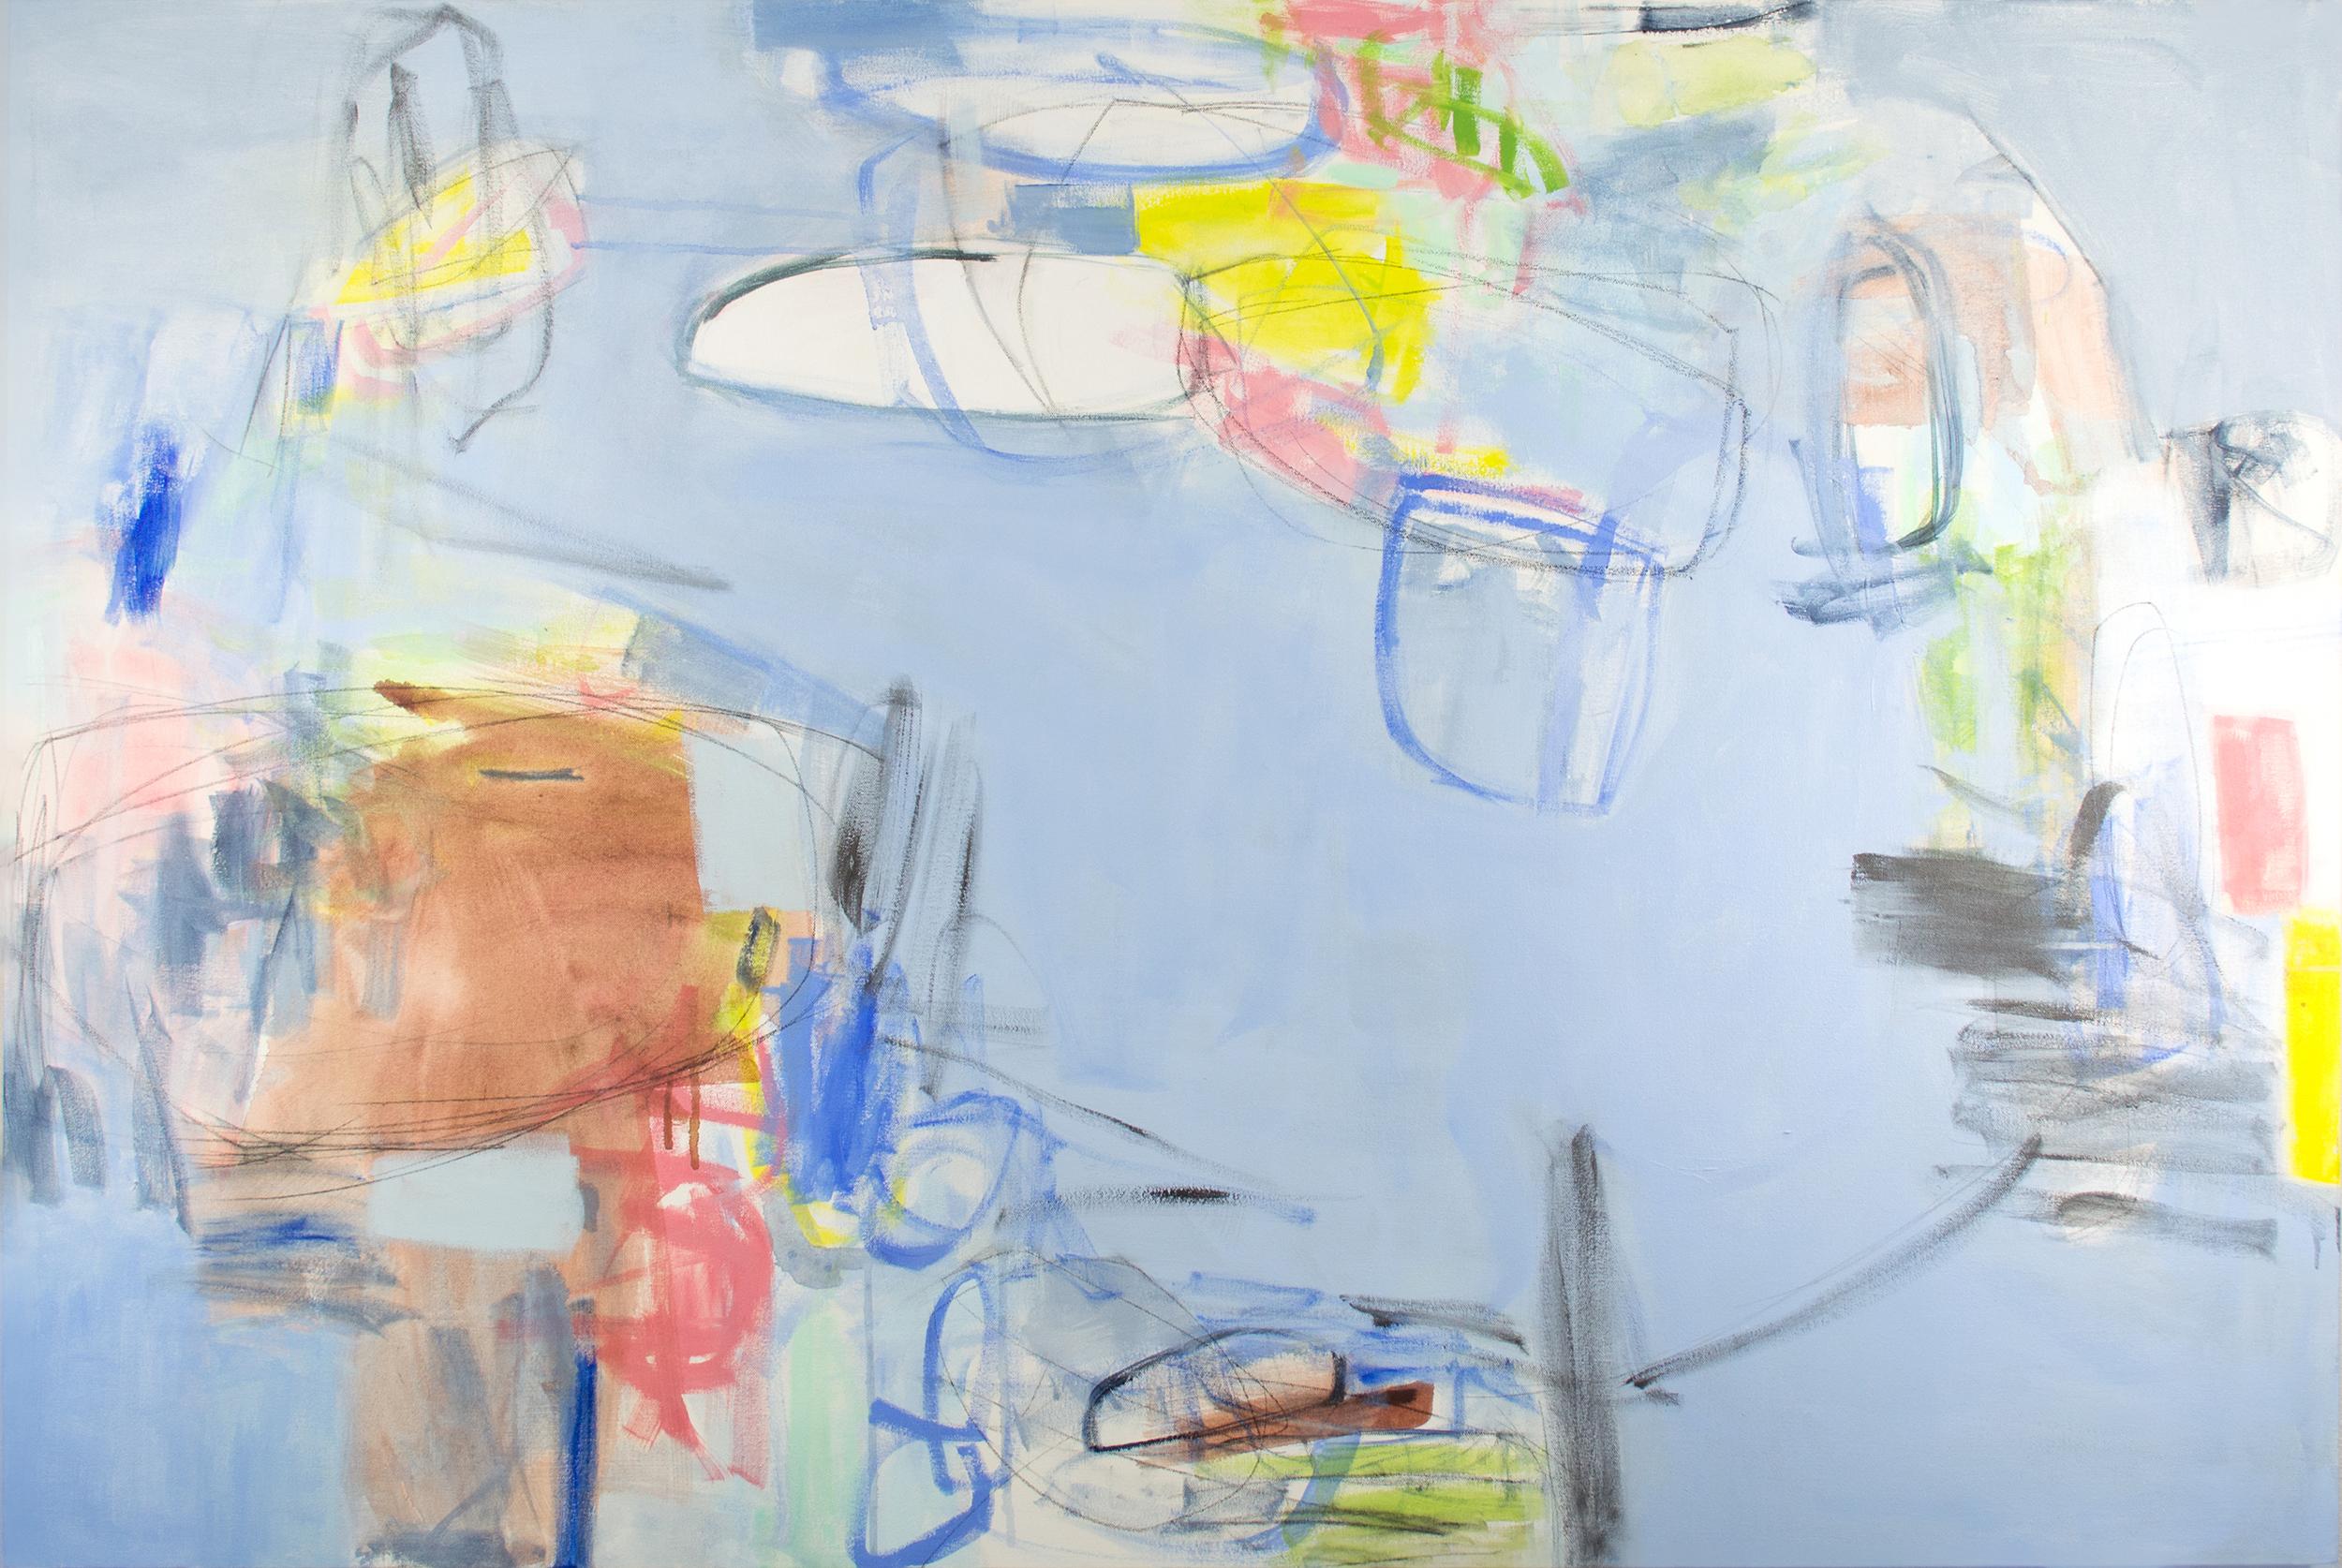 Chasing 360 - Artists exploring process in abstractionFeaturing:Kristen AbbottDeidre AdamsMolly BurgerJessica MageeJulia Rymer